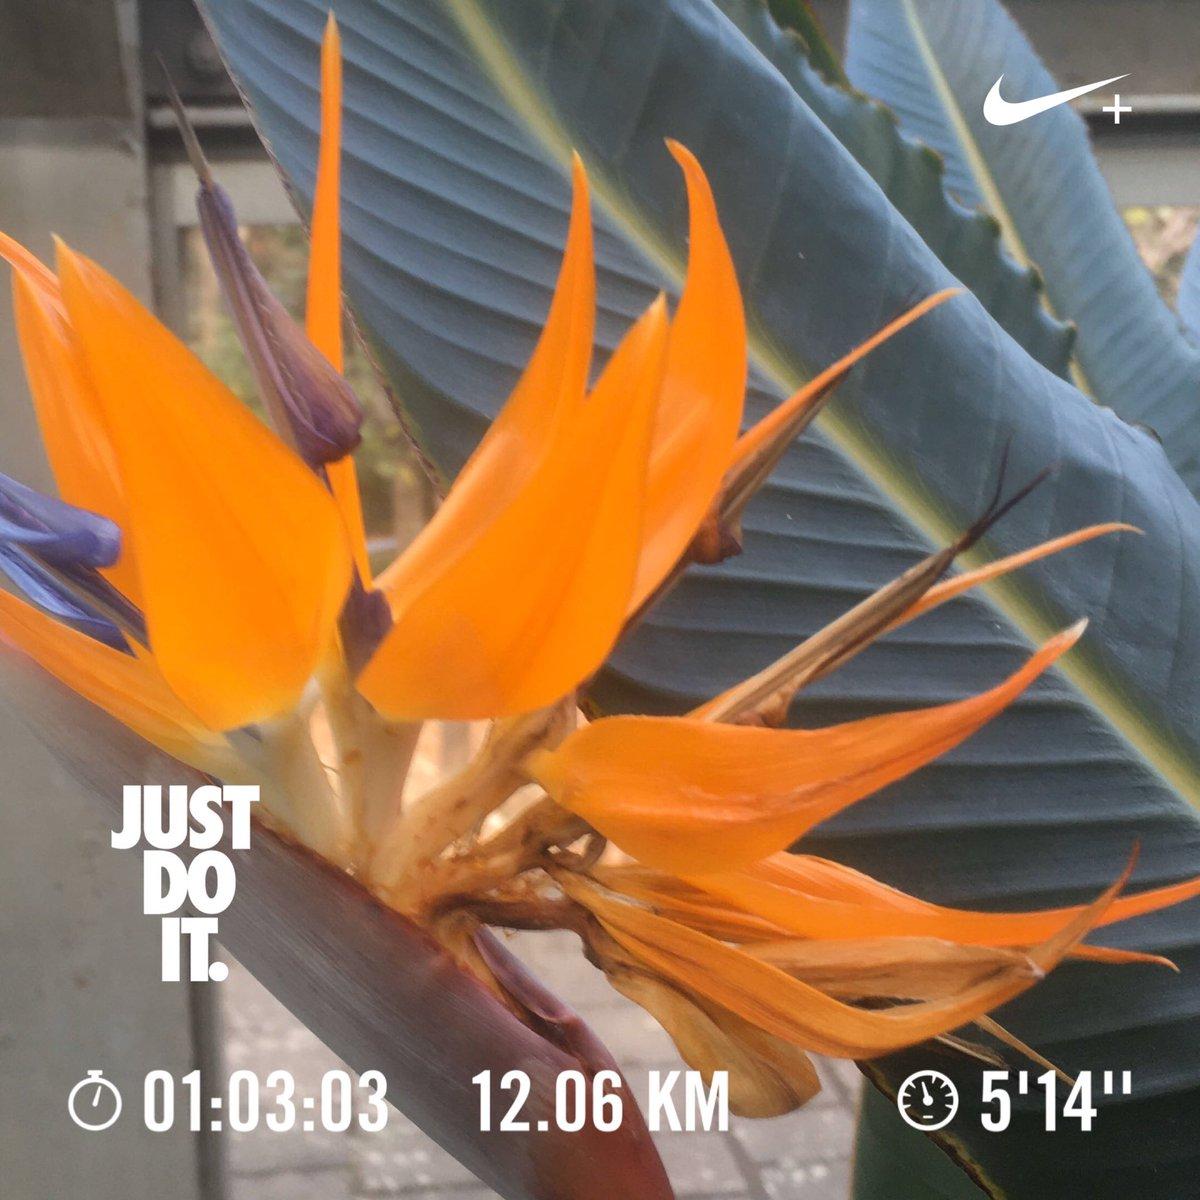 Have a nice day☀️ & nice running! 👟 Today's 🏃♂️:12.1km  Feb..Σ12.1km Today's 📷:My Conservatory Tokyo 🇯🇵 🏃♂️➡️ #NRC #JustDoIt #nikeplus #run #朝ラン #ランニング #runner #UniverseRunners  🌼➡️  #花写真 #花写っと #Flower #ストレチア #極楽鳥花 #Strelitzia #温室